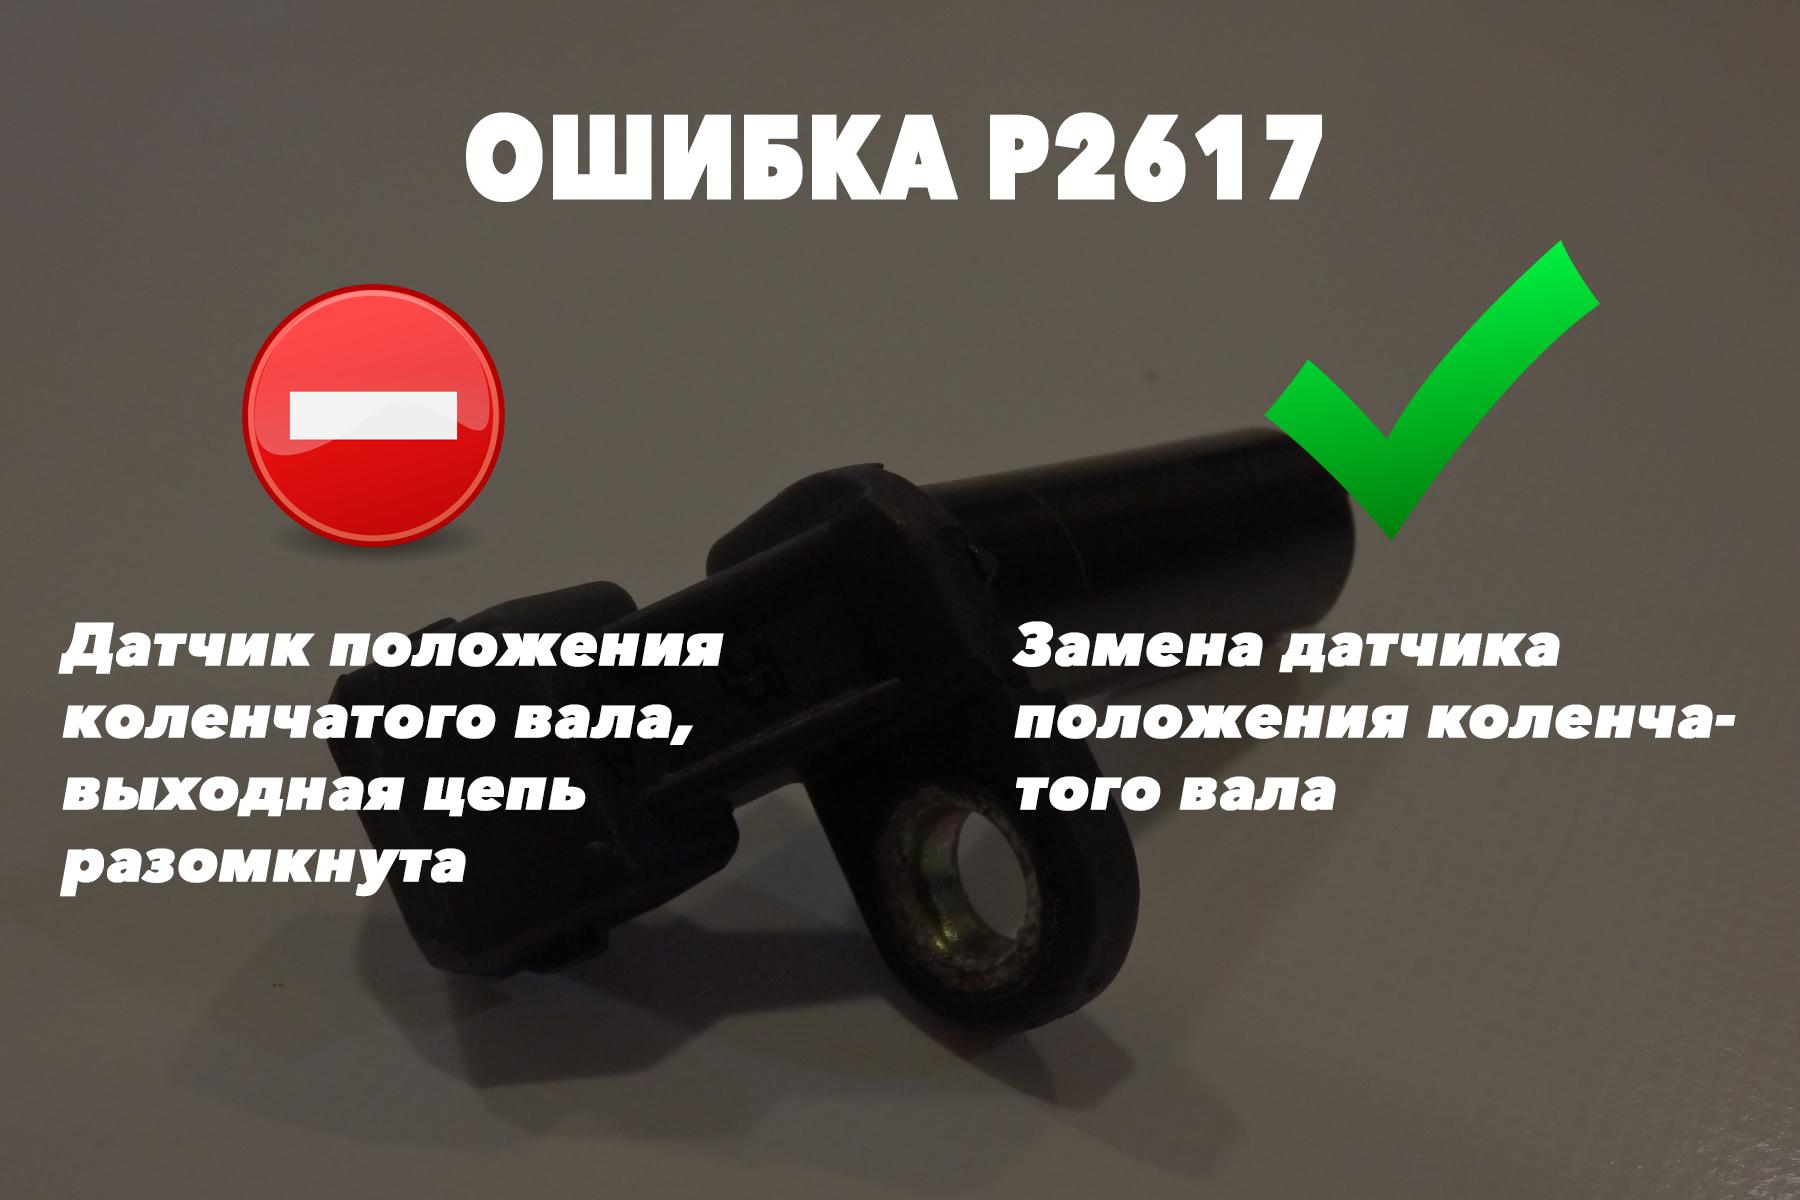 P2617 – датчик коленвала